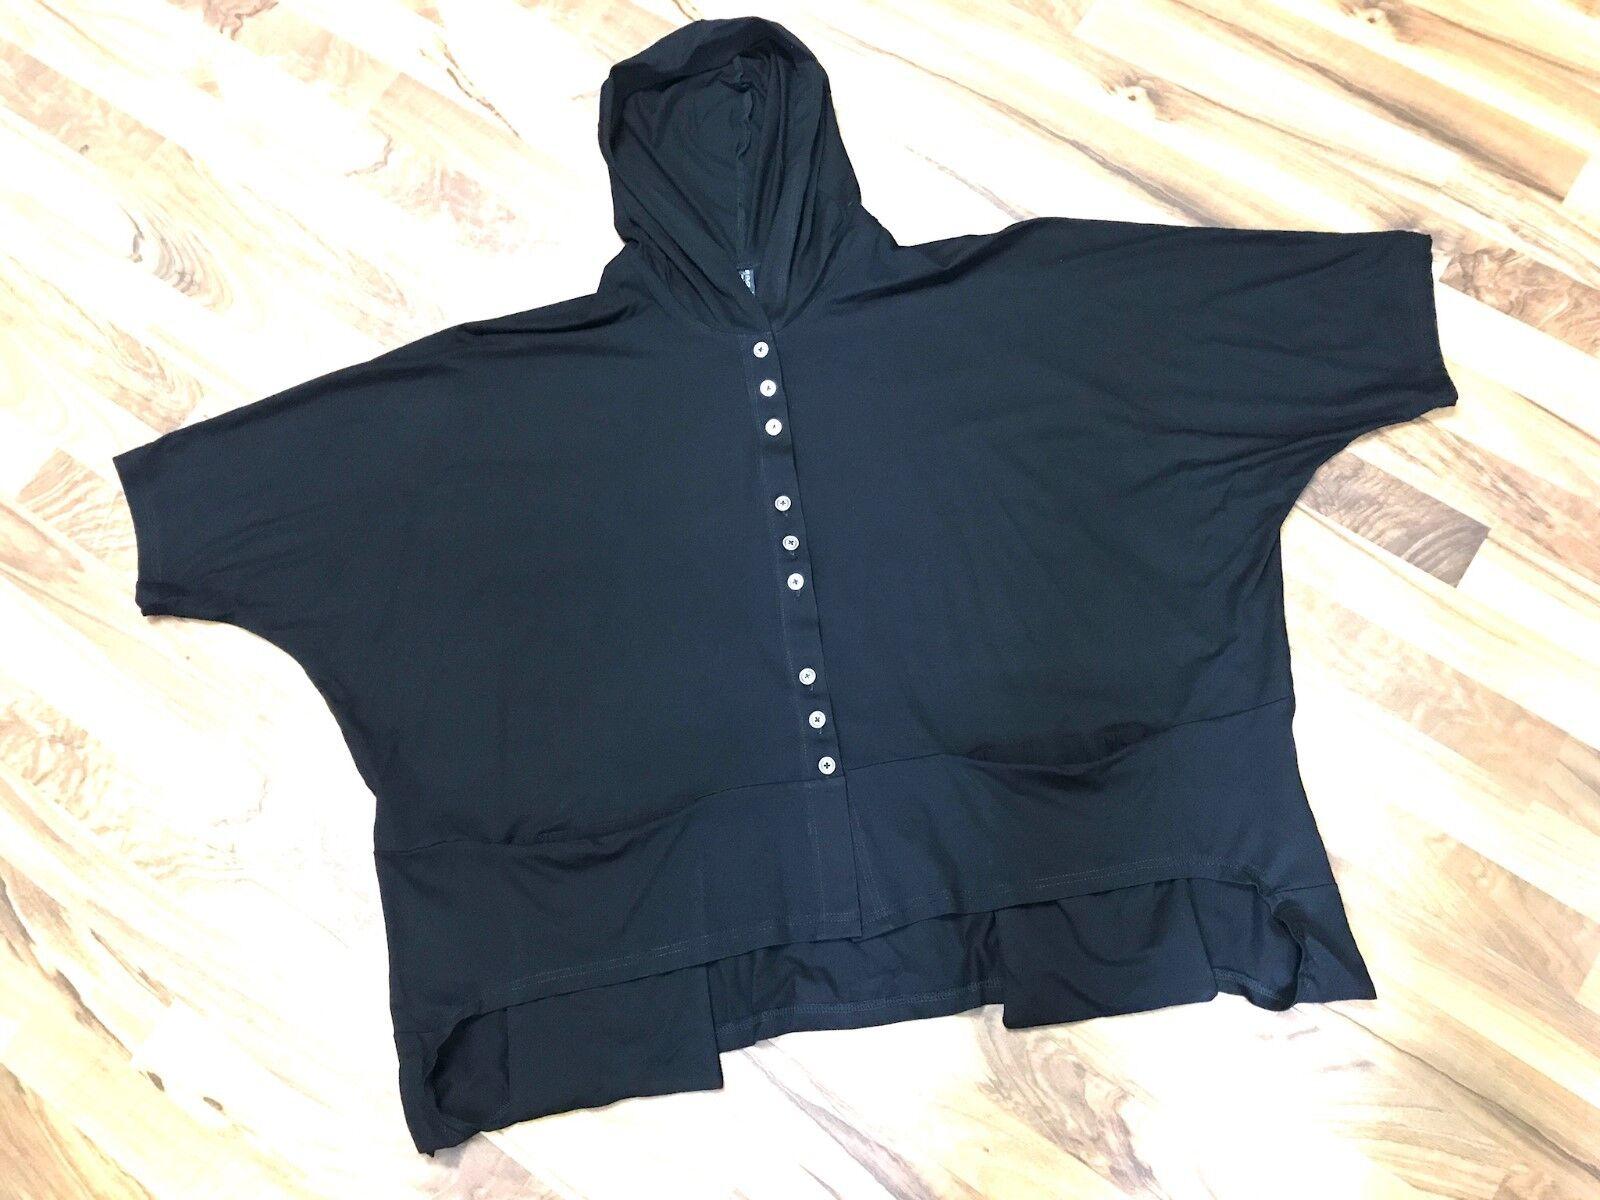 Myo-Lagenlook Big-overTallad capucha-recuadro-chaqueta hängetaschen Jersey XL, XXL,  XXXL  ahorra hasta un 50%